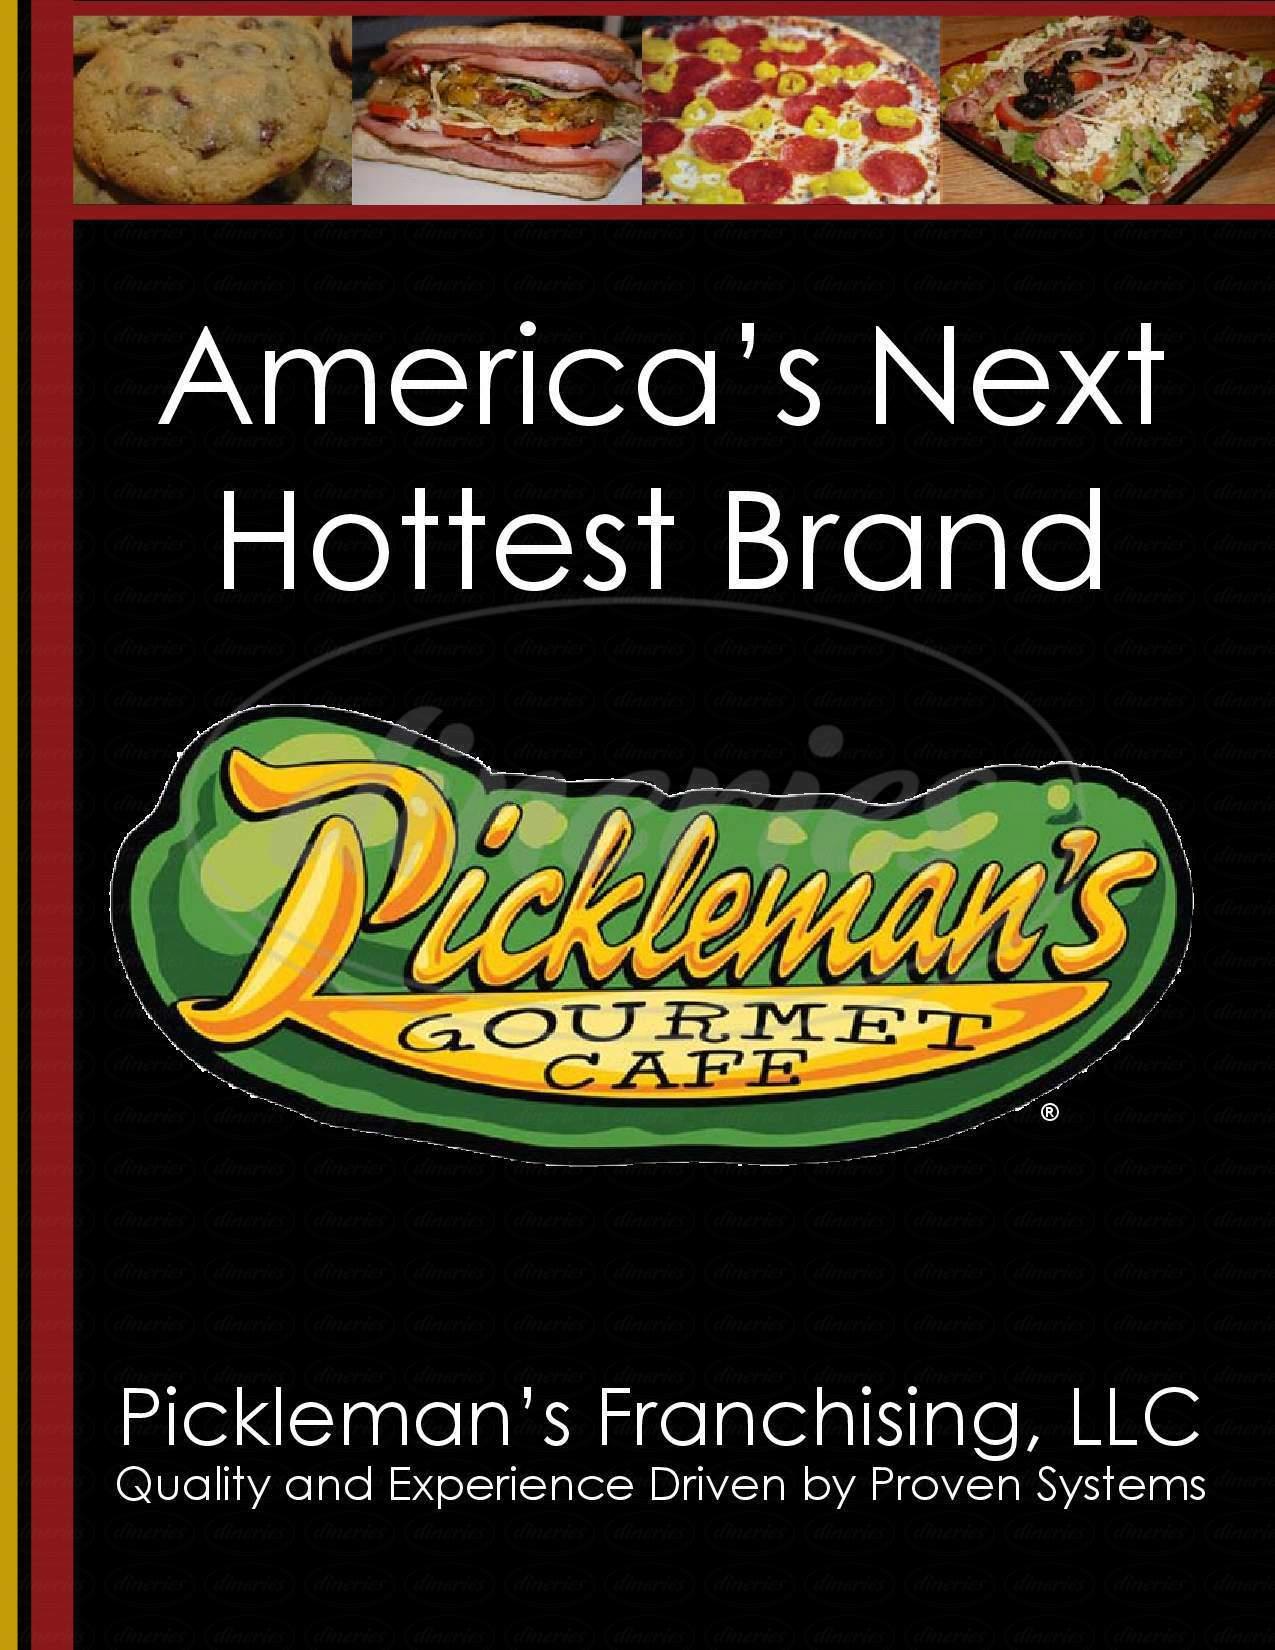 menu for Pickleman's Gourmet Cafe